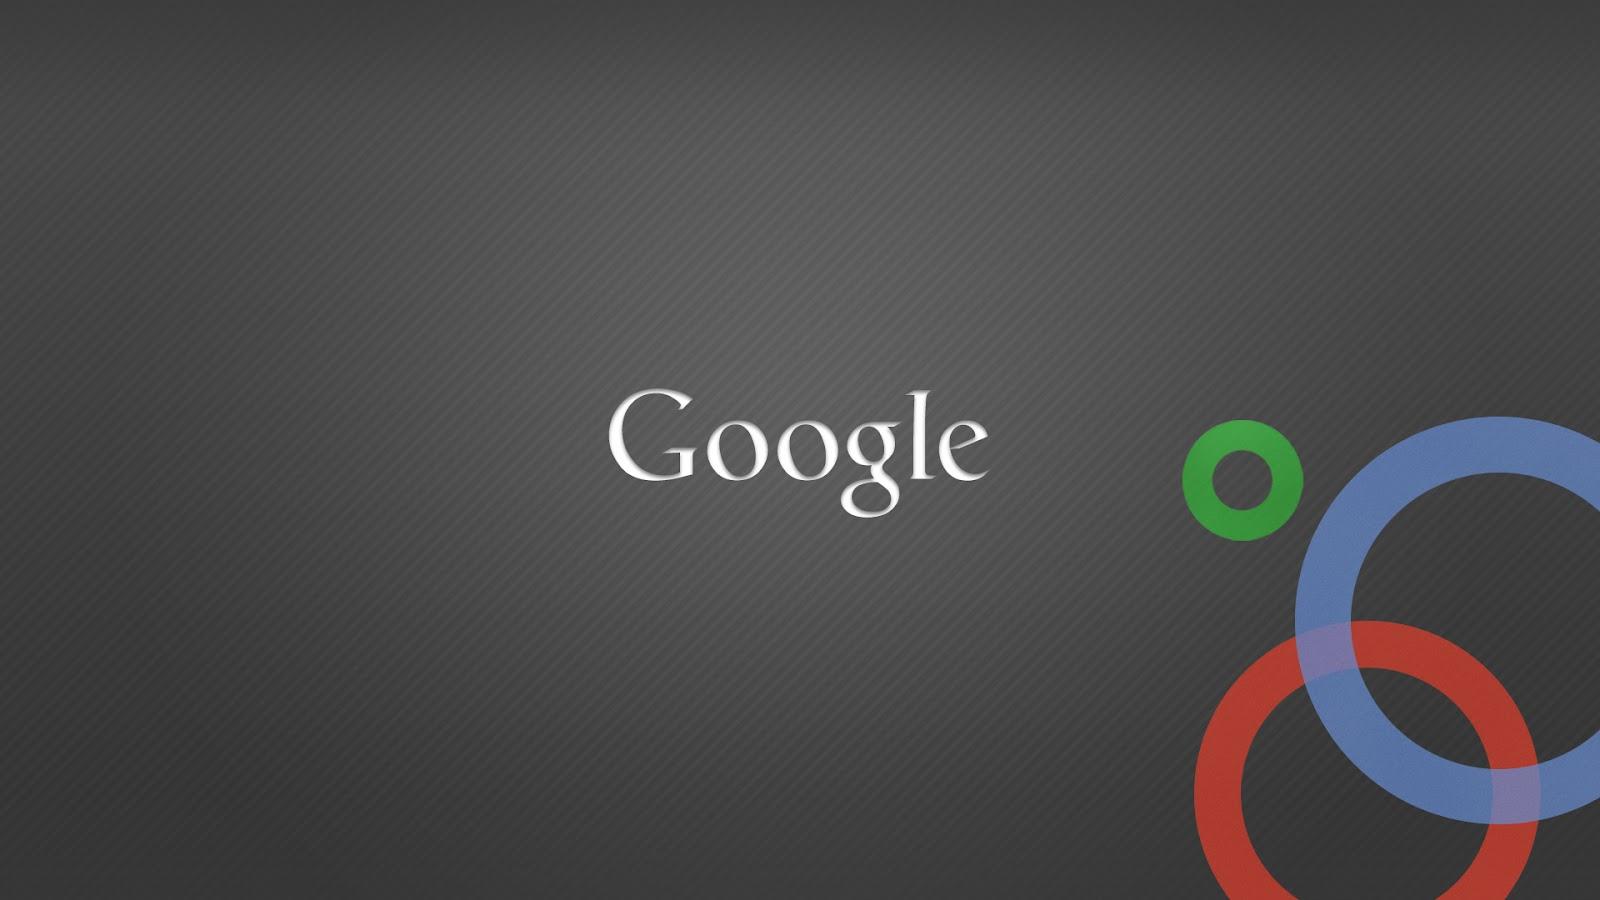 10 Google+ Plus HD Wallpapers 2012 ~ SEO Urdu Pakistan   Blogging Techniques   Latest Jobs in ...